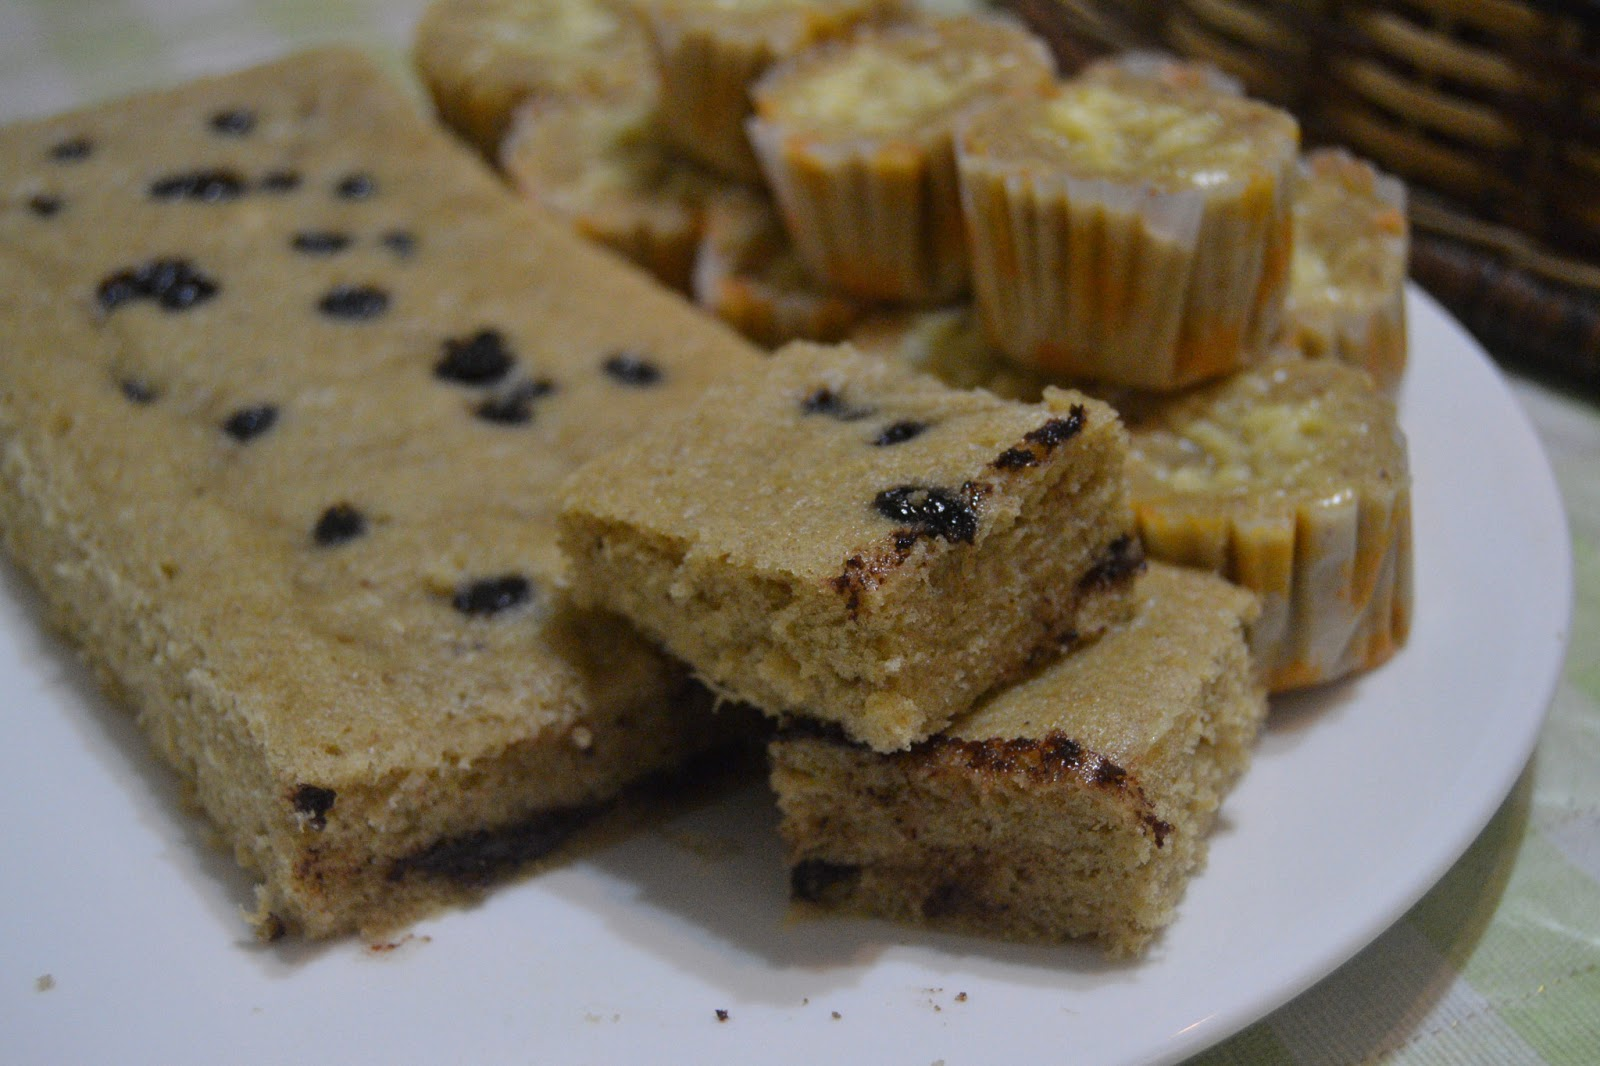 Resep Cake Jadul Enak: Resep Cake Kukus Pisang Enak